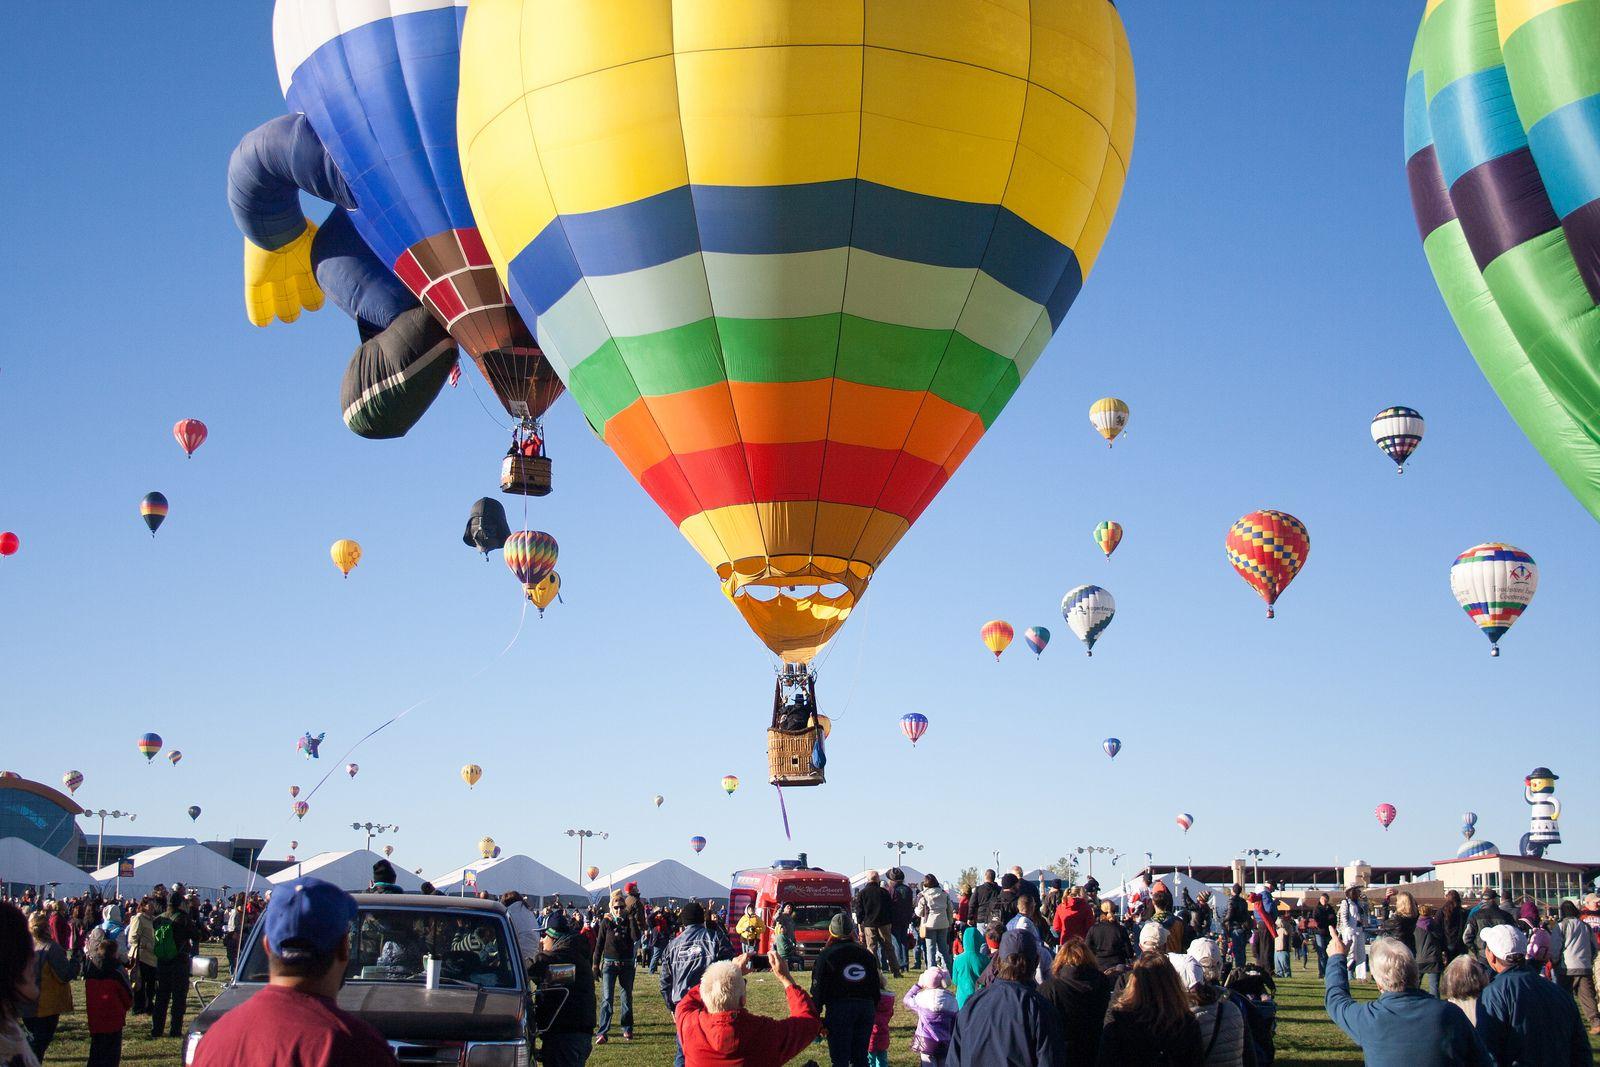 Balloon flight during a festival in France. Oui oui!